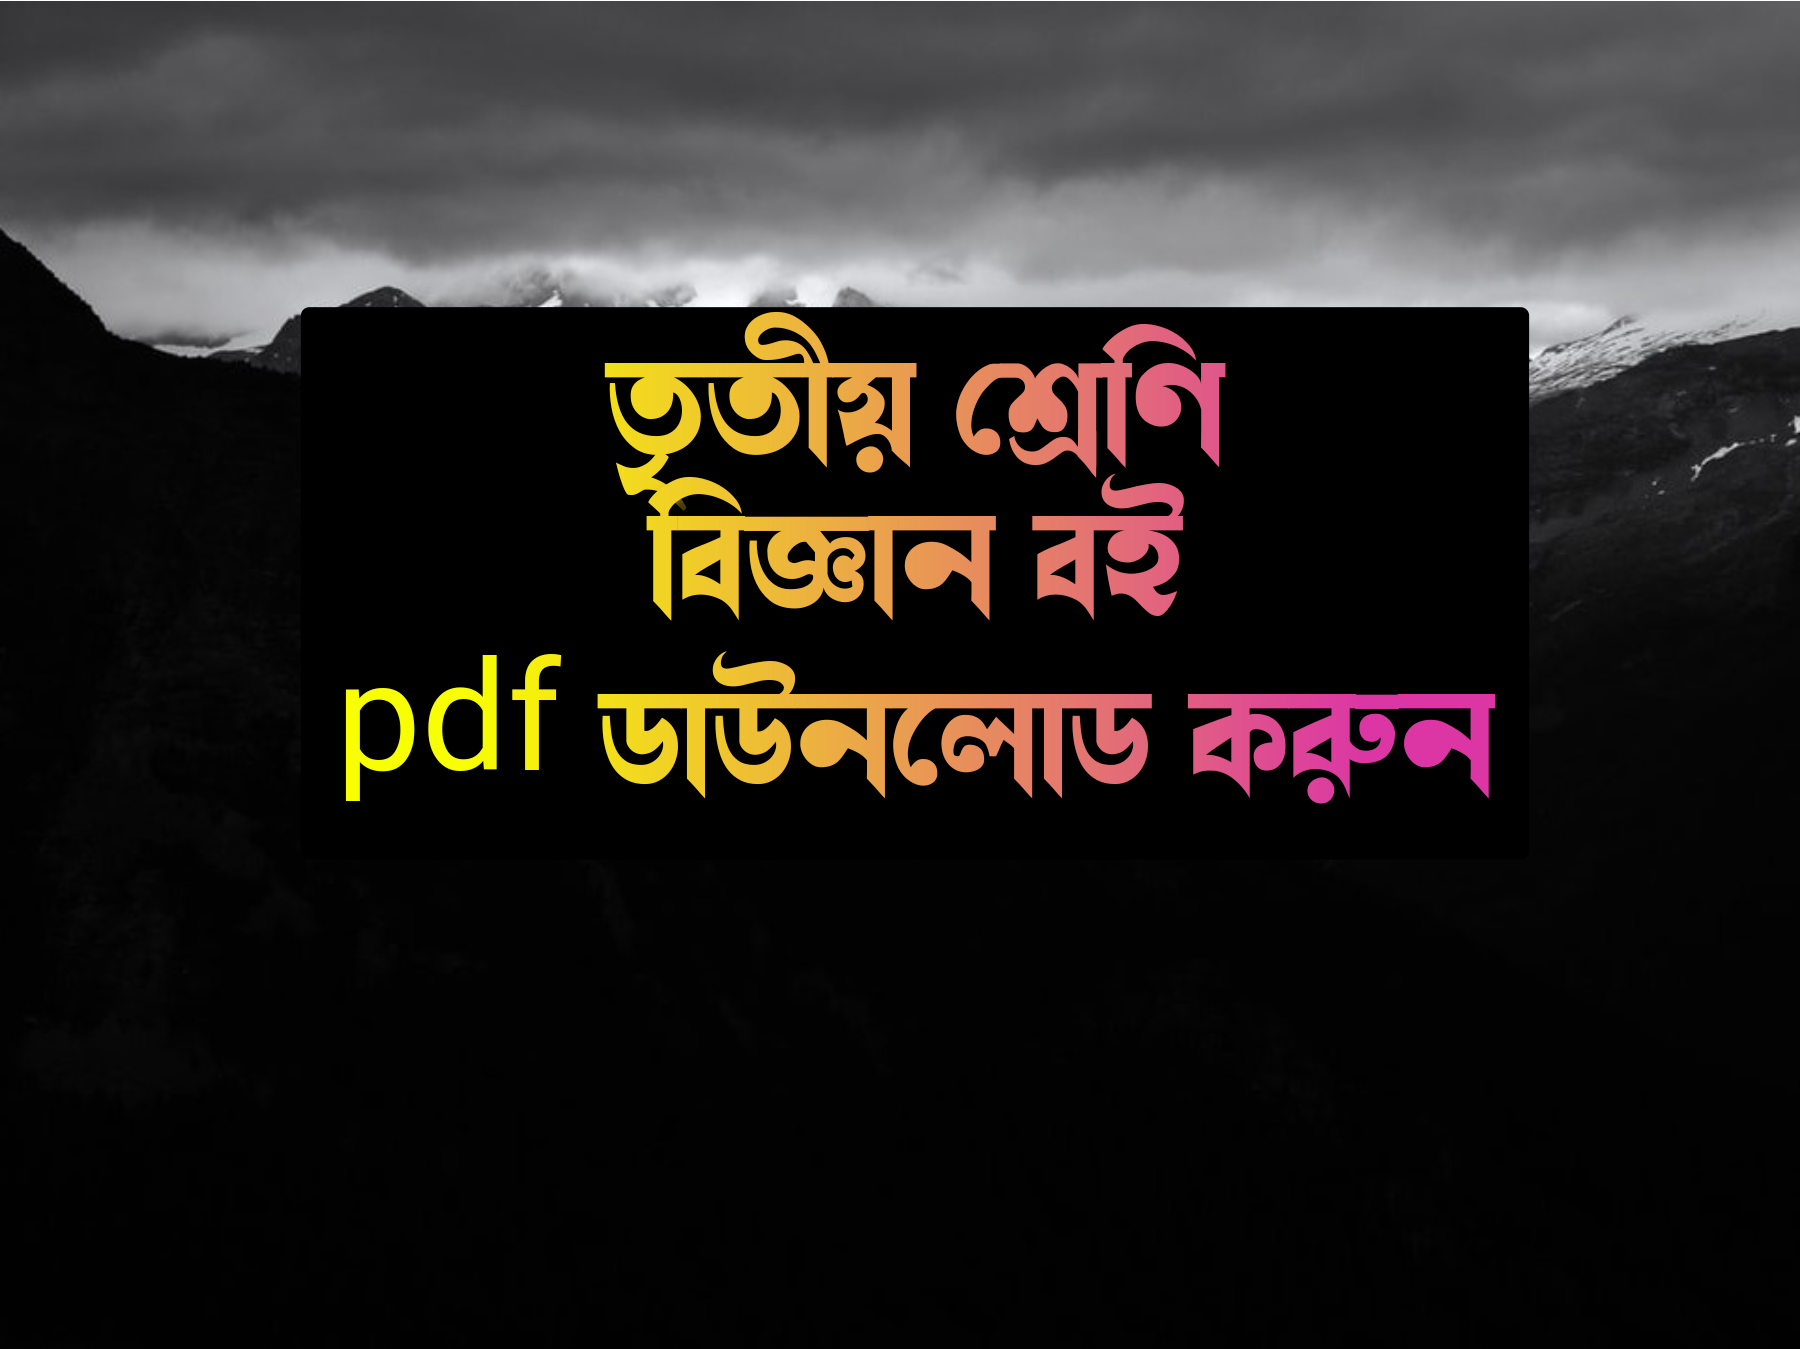 Class Three science book pdf download   তৃতীয় শ্রেণীর বিজ্ঞান বই pdf download করুন